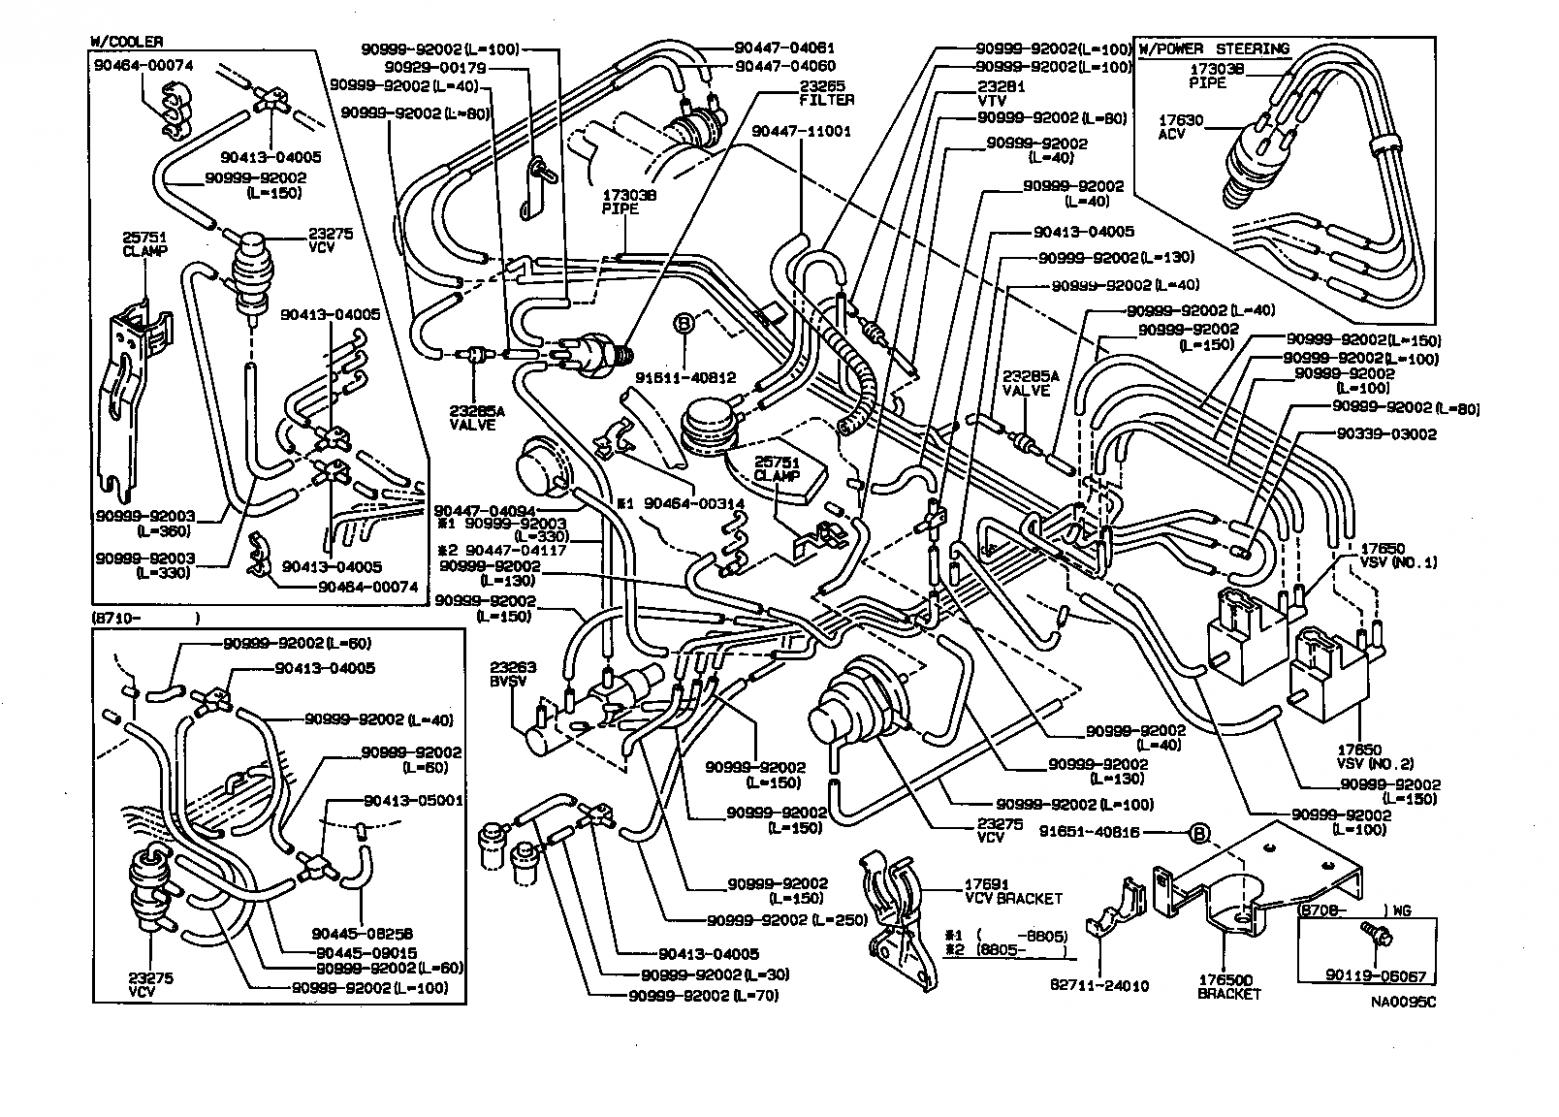 Toyota Corolla 7e Engine Vacuum Diagram Toyota Corolla 7e ...